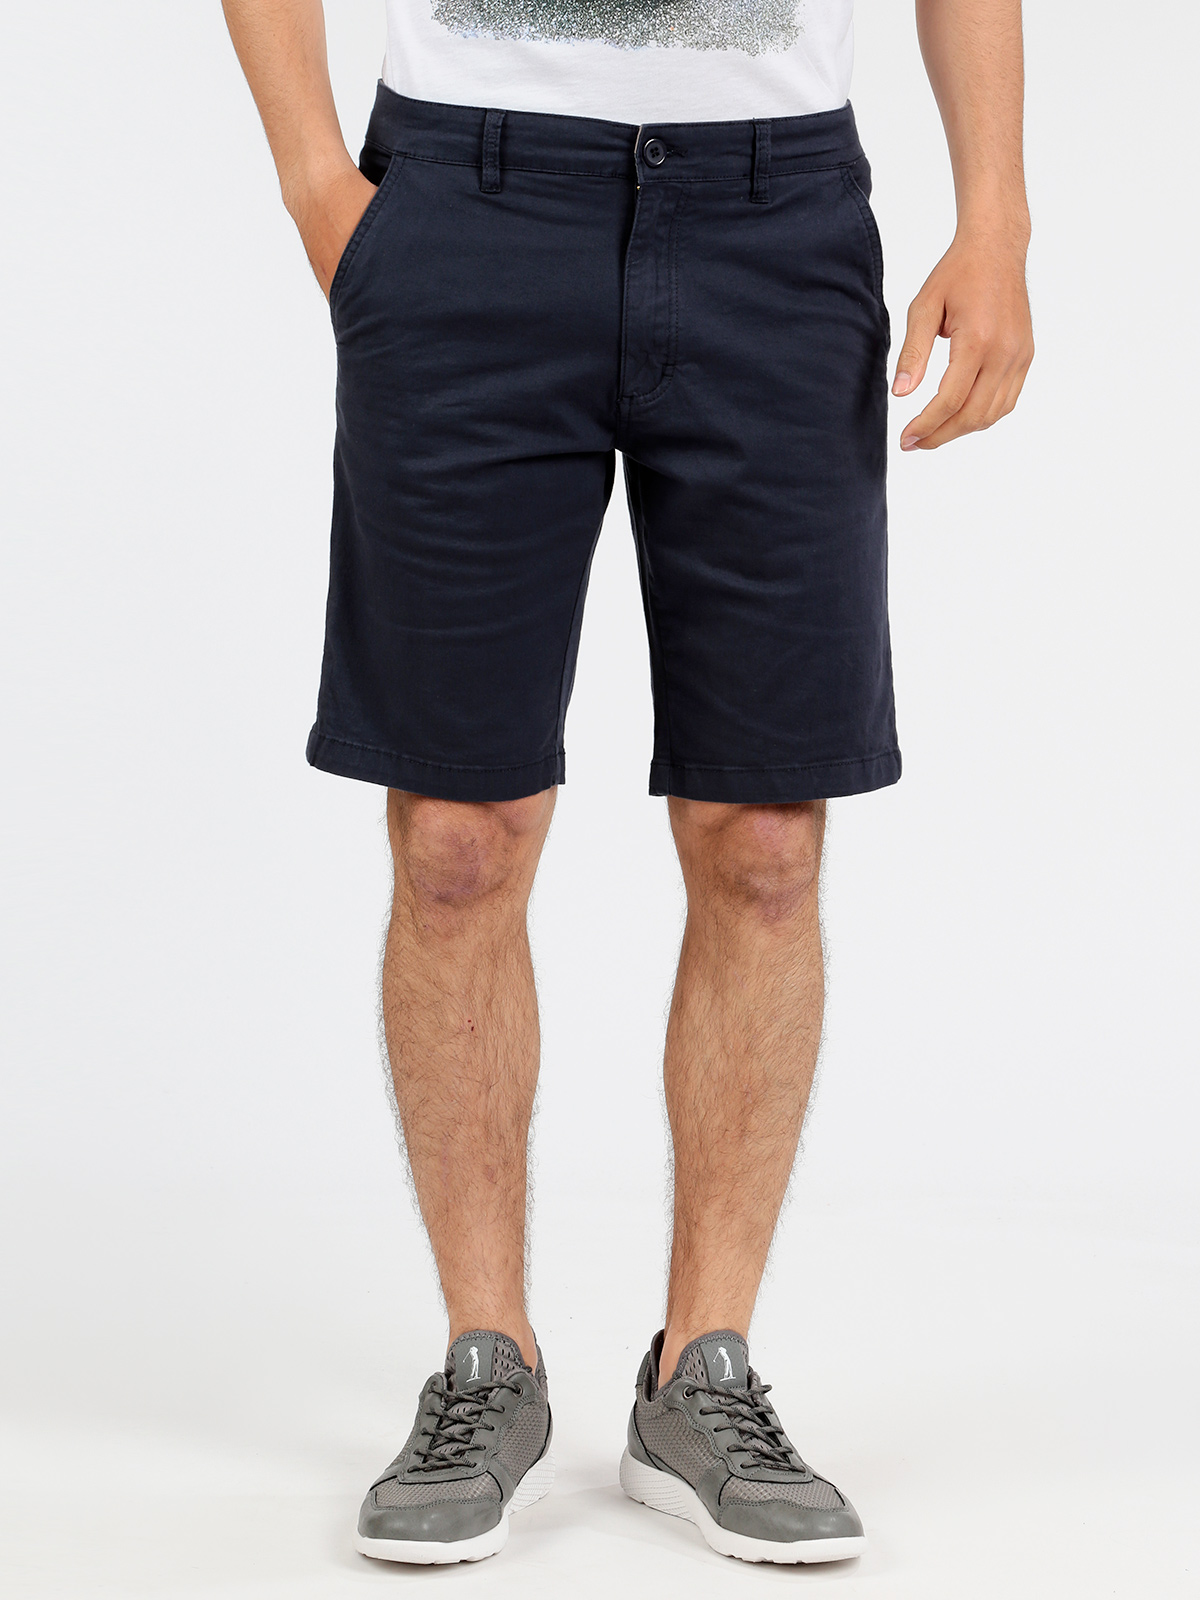 Bear Men's Summer Casual Shorts